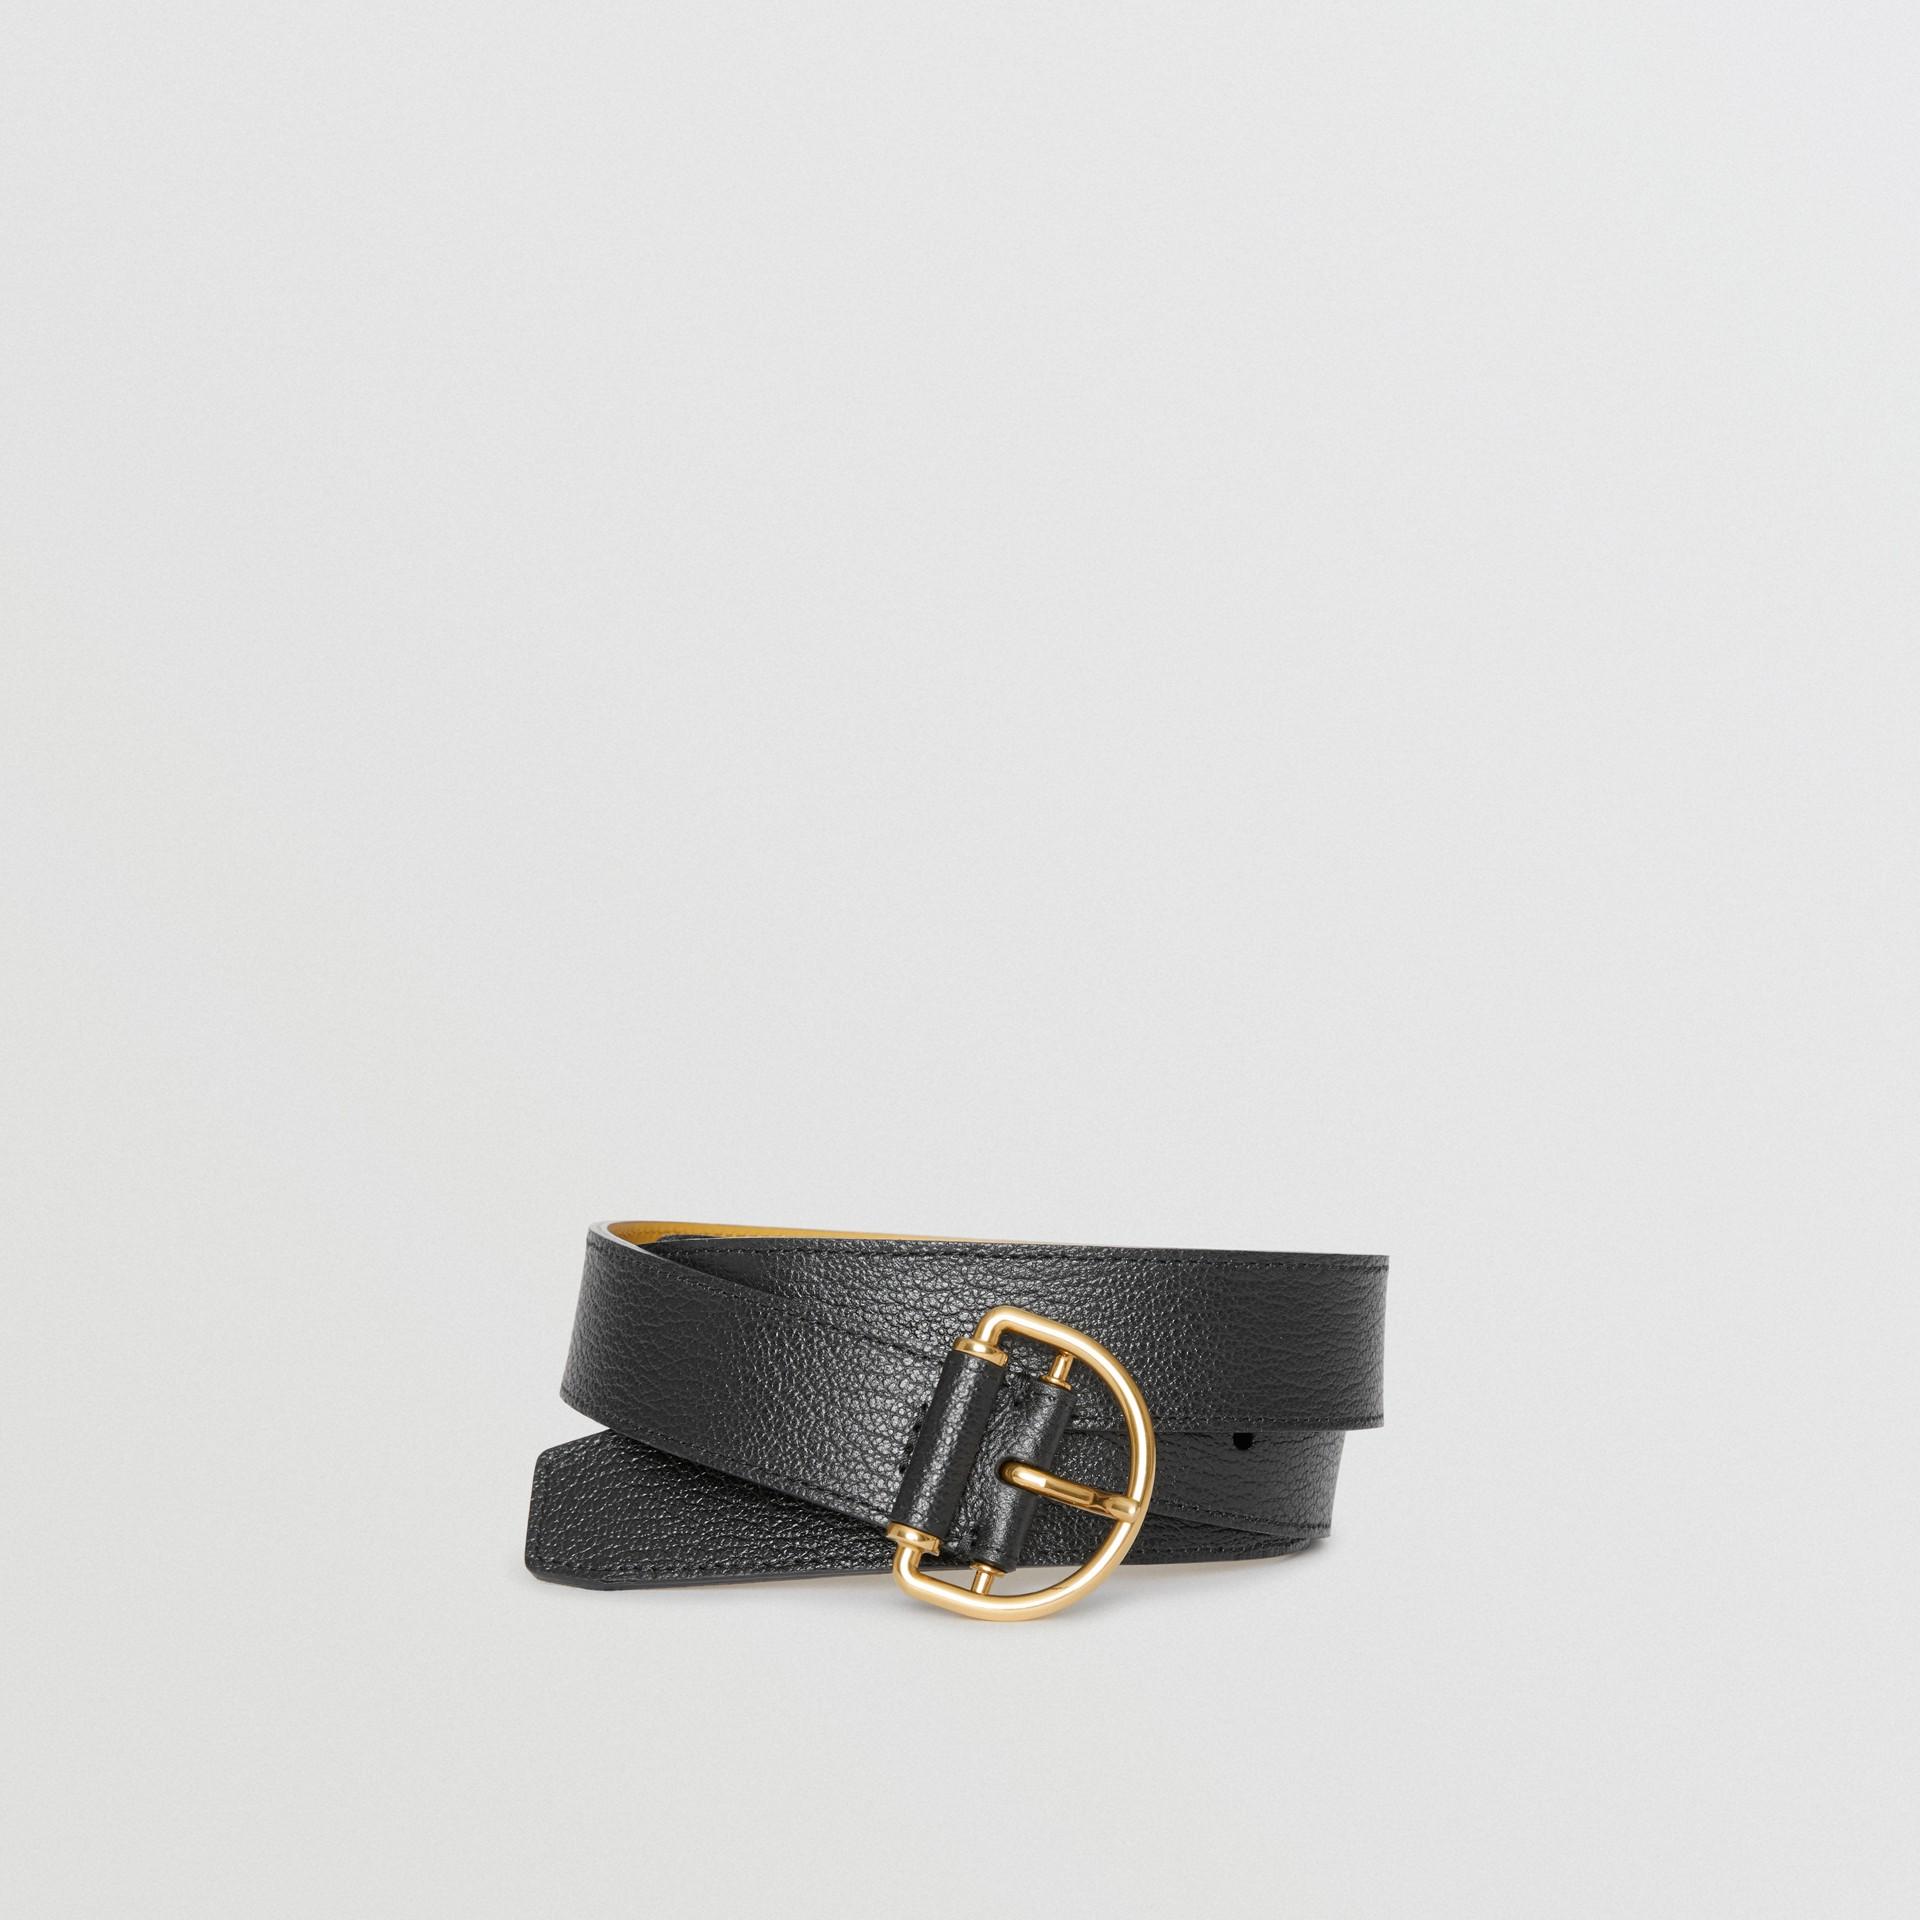 Grainy Leather D-ring Belt in Black/cornflower - Women | Burberry Australia - gallery image 0